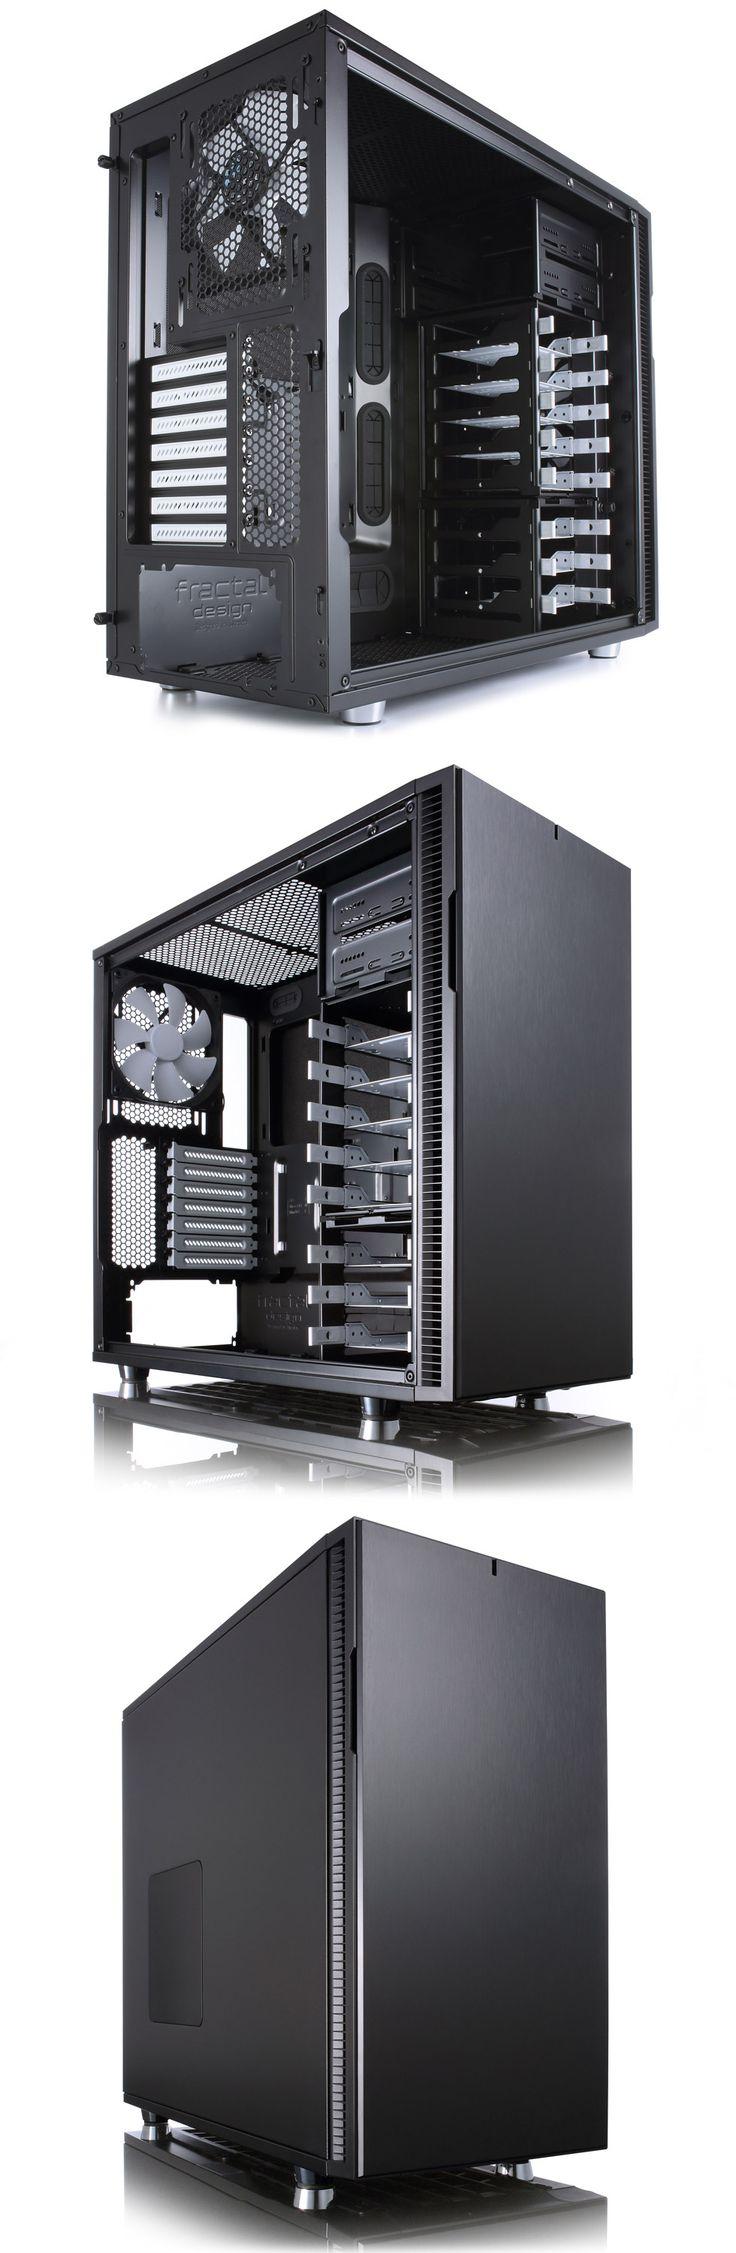 Fractal Design Define R5 Mid Tower Black [FD-CA-DEFR5-BK] : PC Case Gear